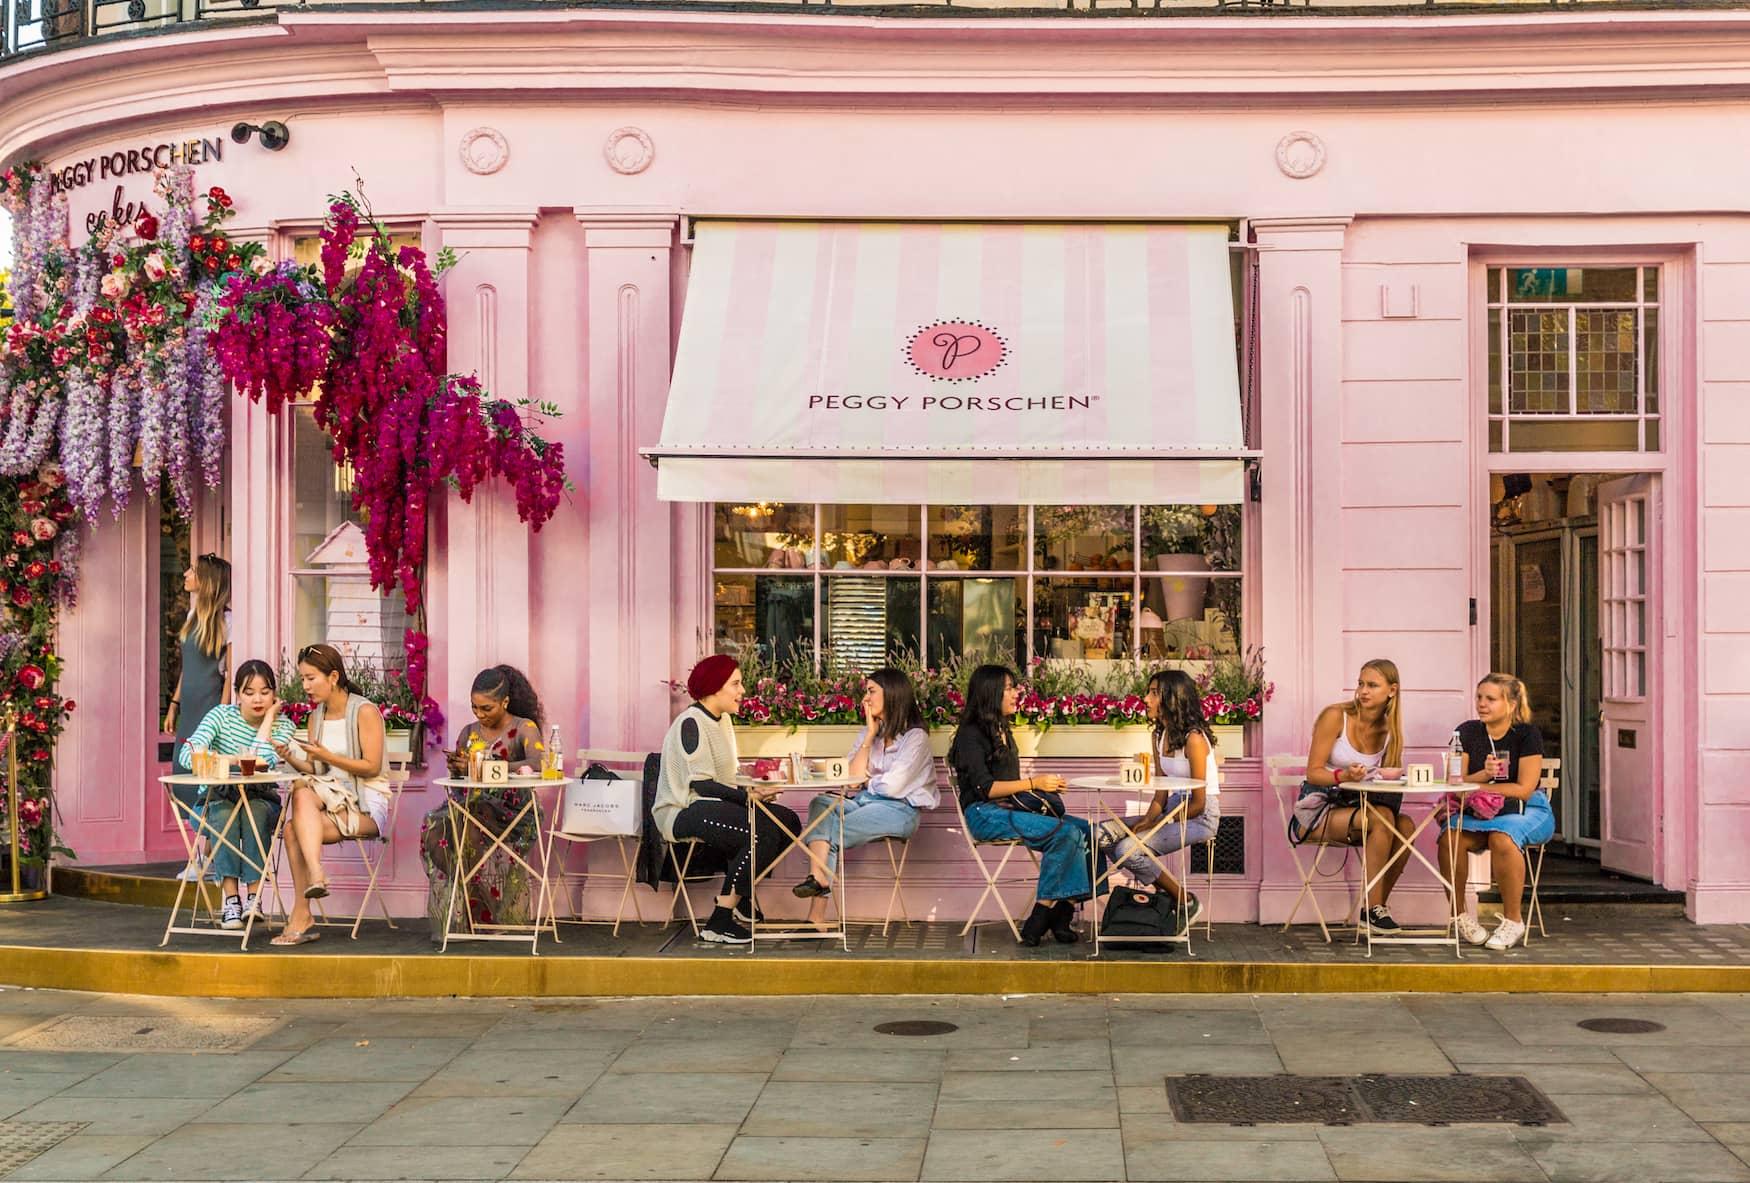 Pinke Hausfassade des Peggy Porschen Cafes in London